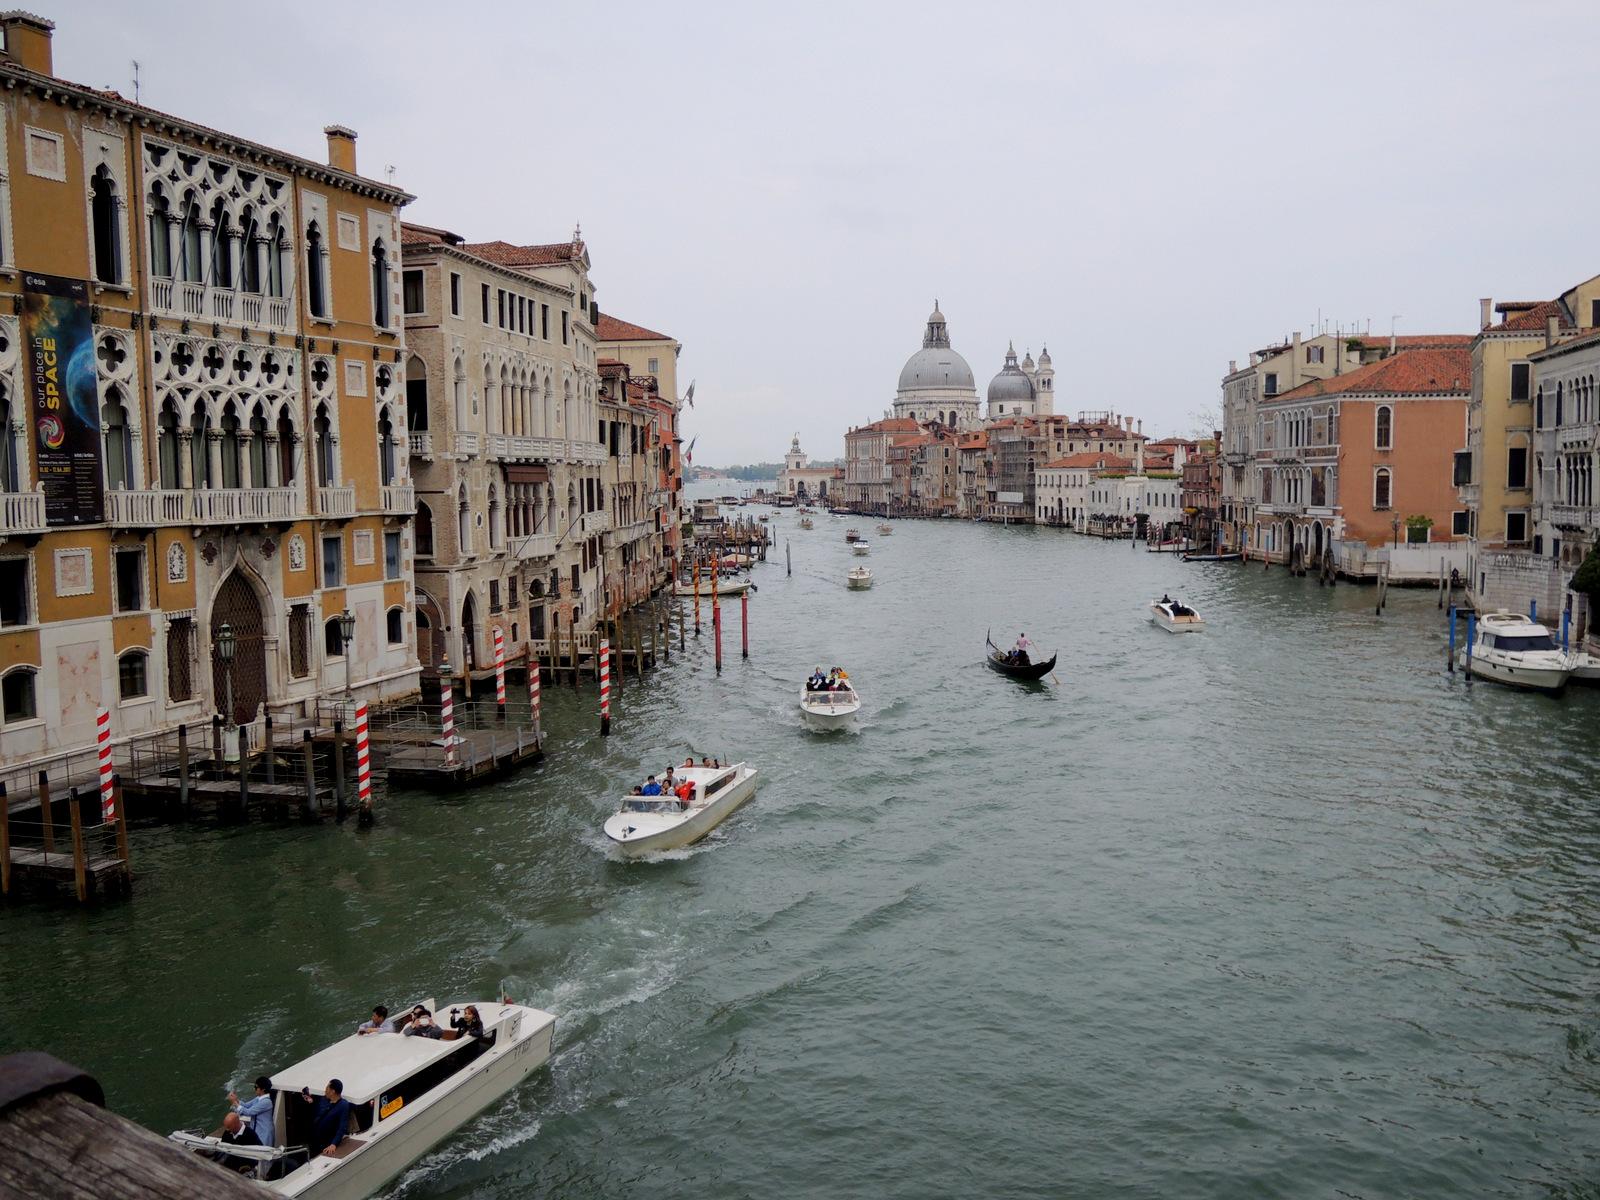 Easter 2017 - Italy - 2.day // Venezia, Benátky